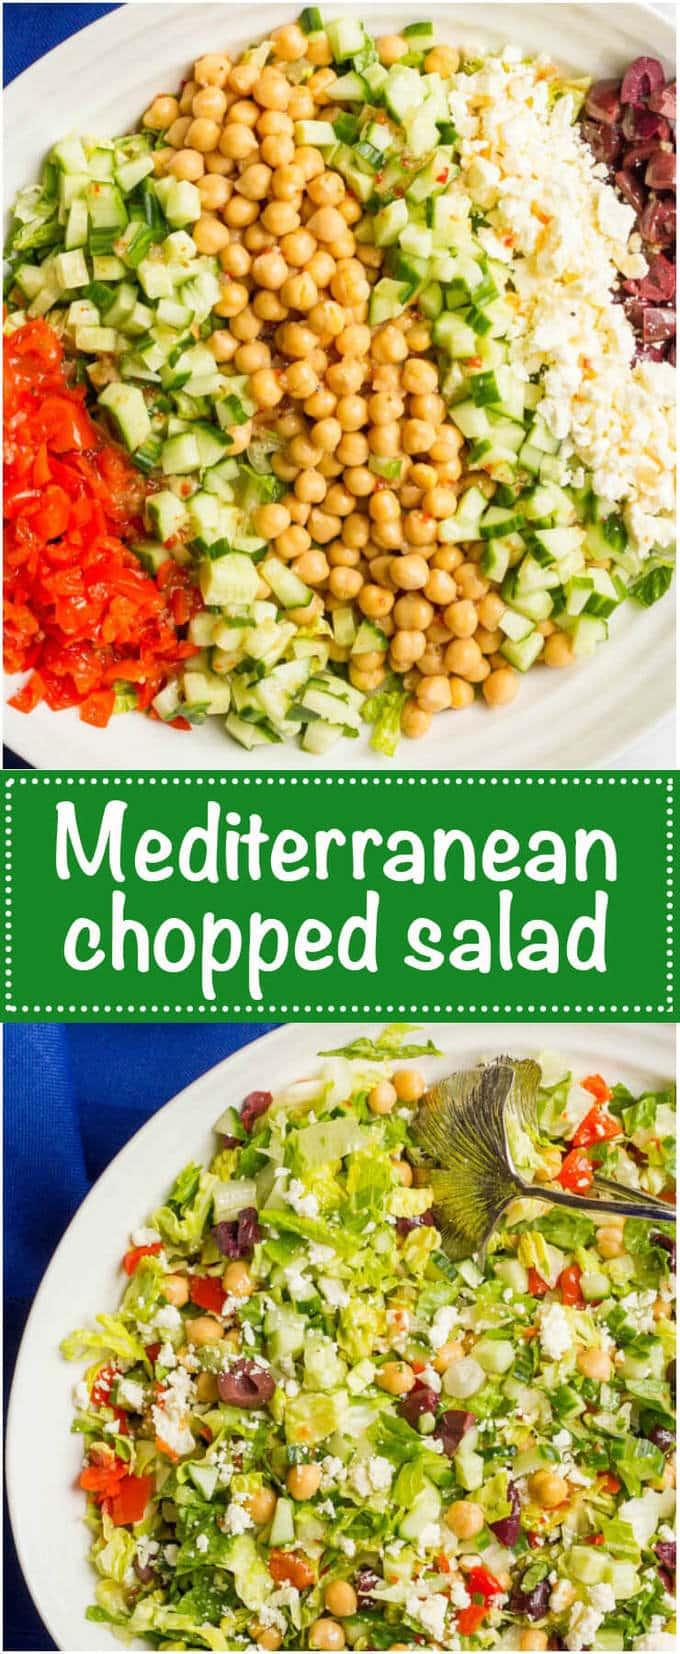 ... olives mediterranean tostada with hummus feta and kalamata olives